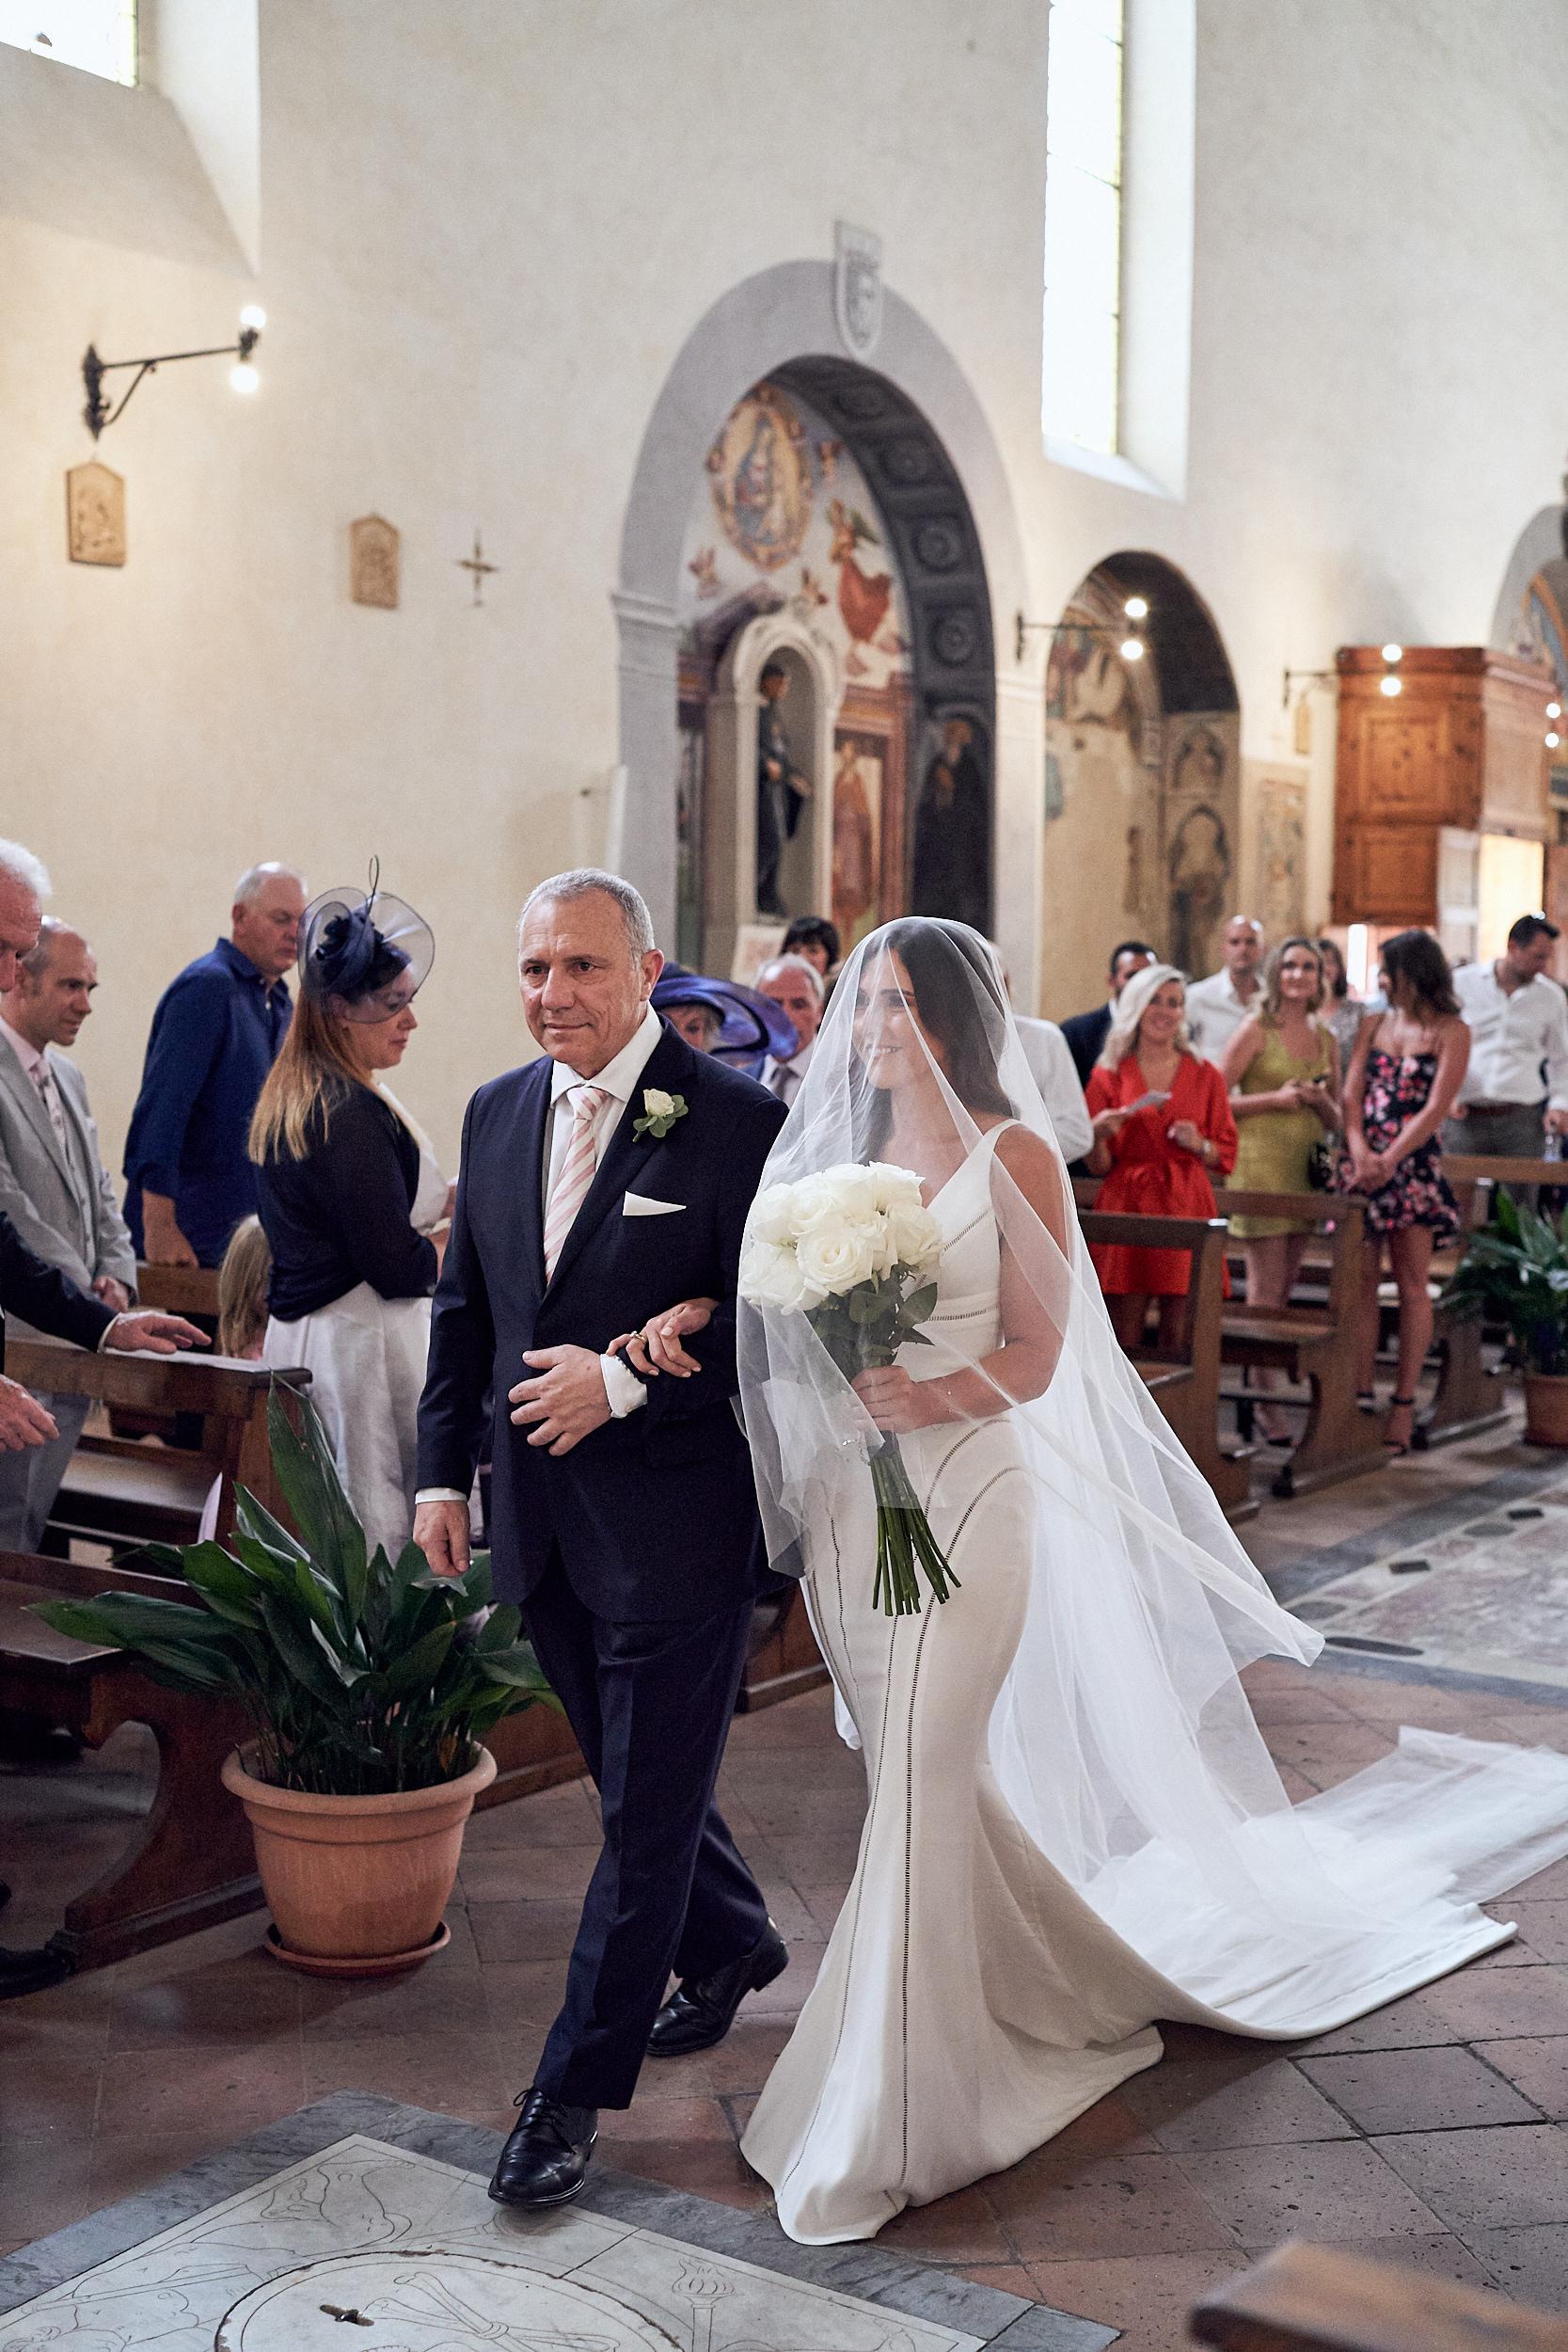 LR_JandA_Tuscanywedding_lostinlove 9.jpg